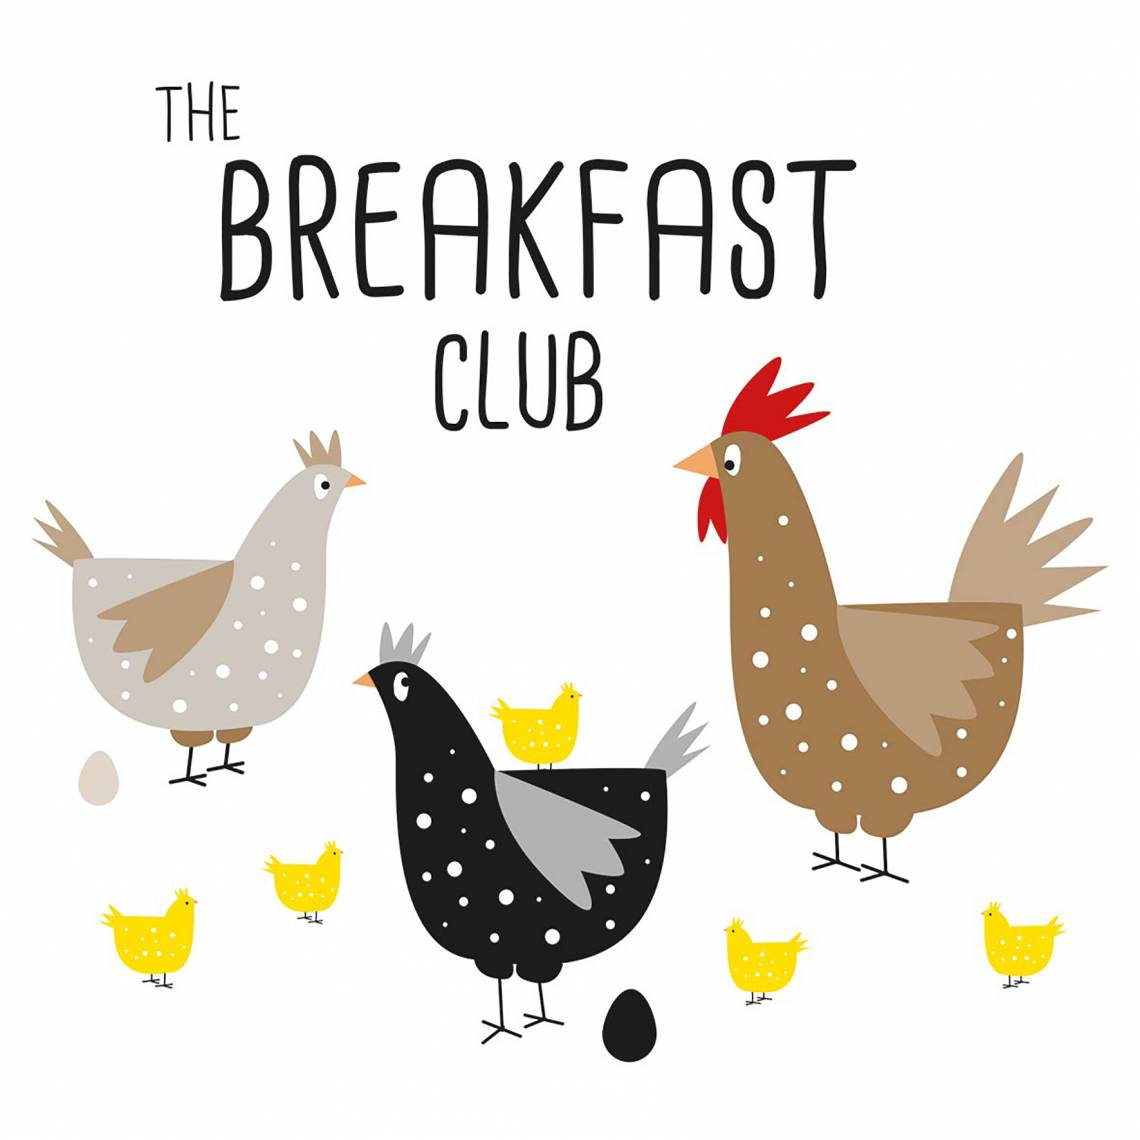 PPD 1333961 The Breakfast Club Napkin